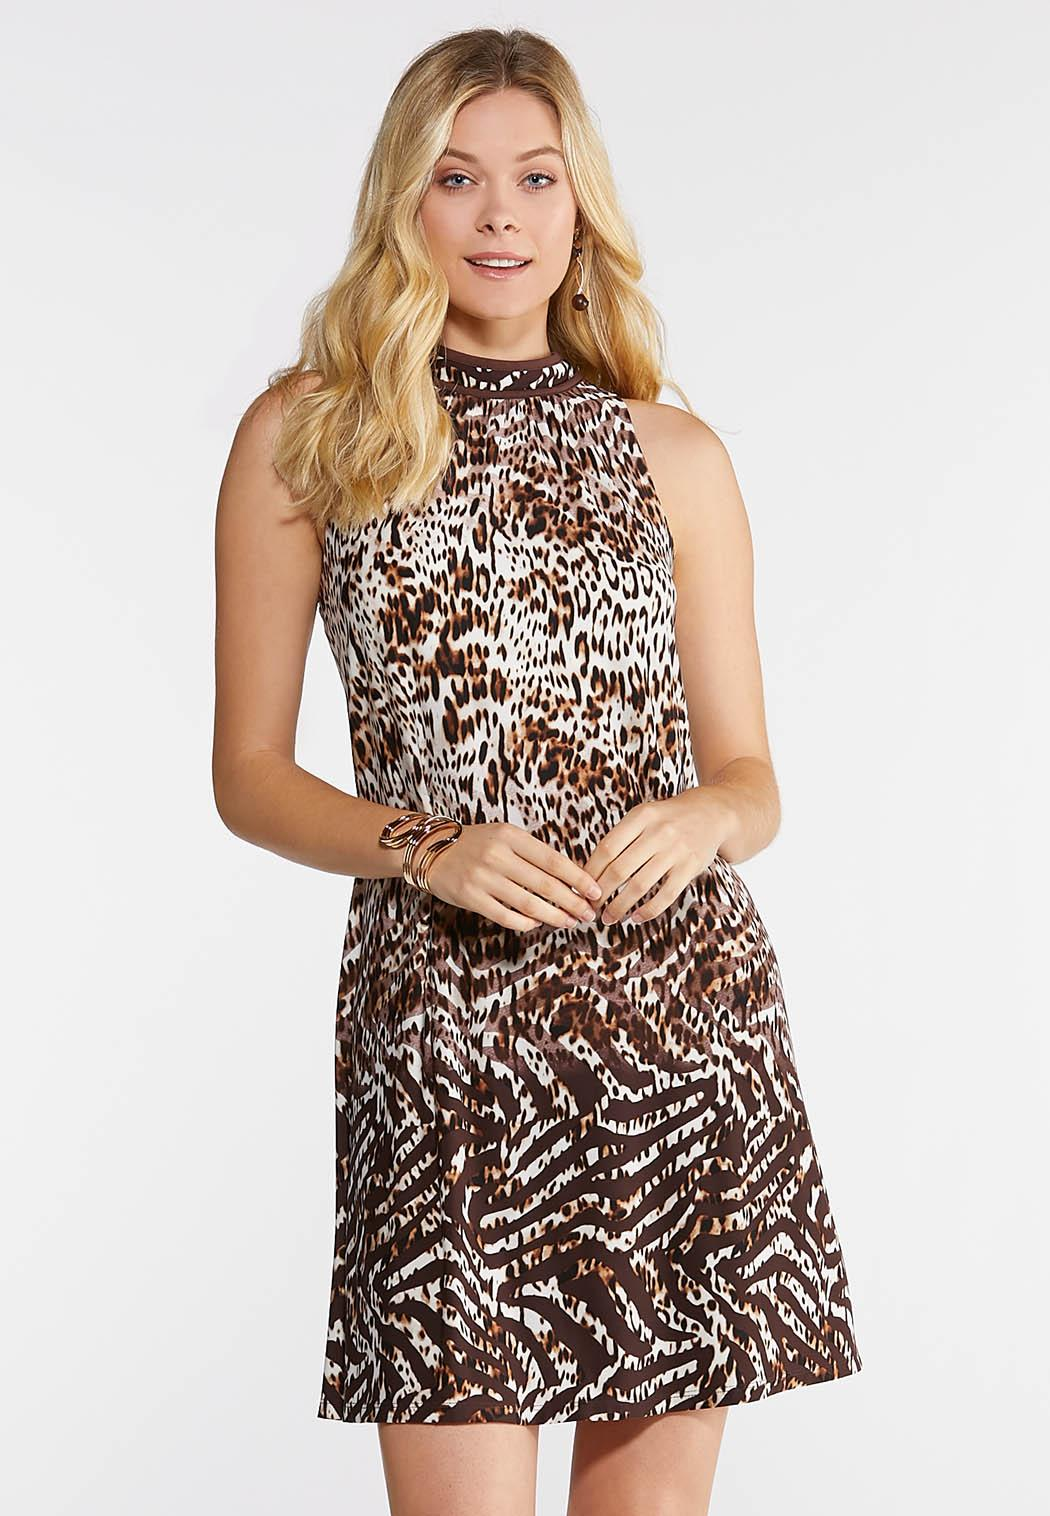 f42b014b7ae Plus Size Dresses For Women - Swing, Maxi, Midi & More